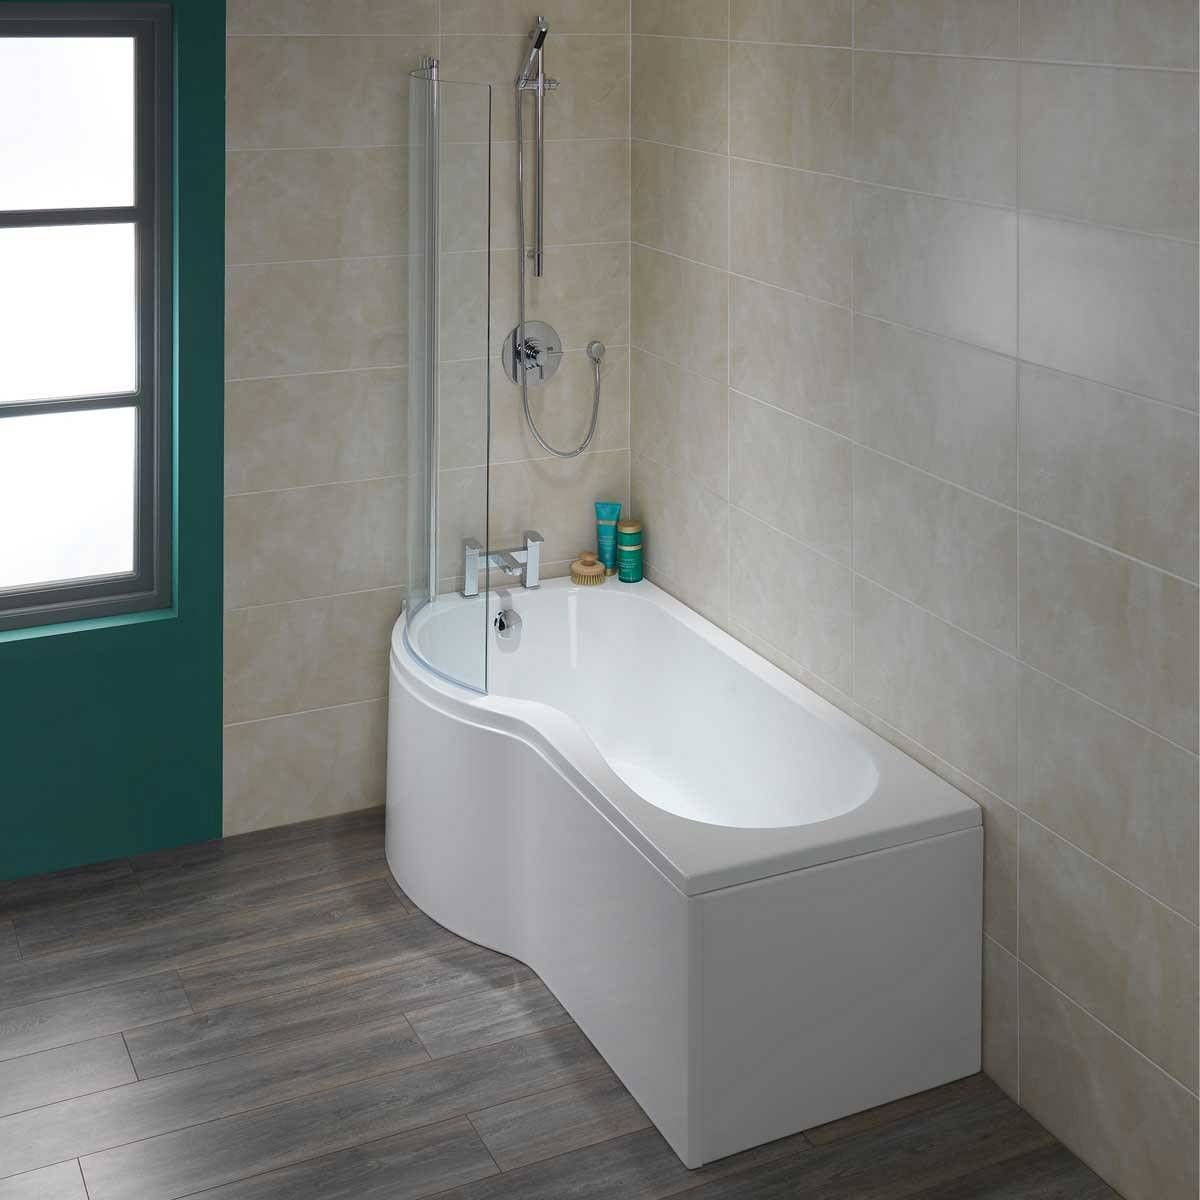 P Shape Shower Bath 1700 Lh Amp Screen New Bathroom Ideas